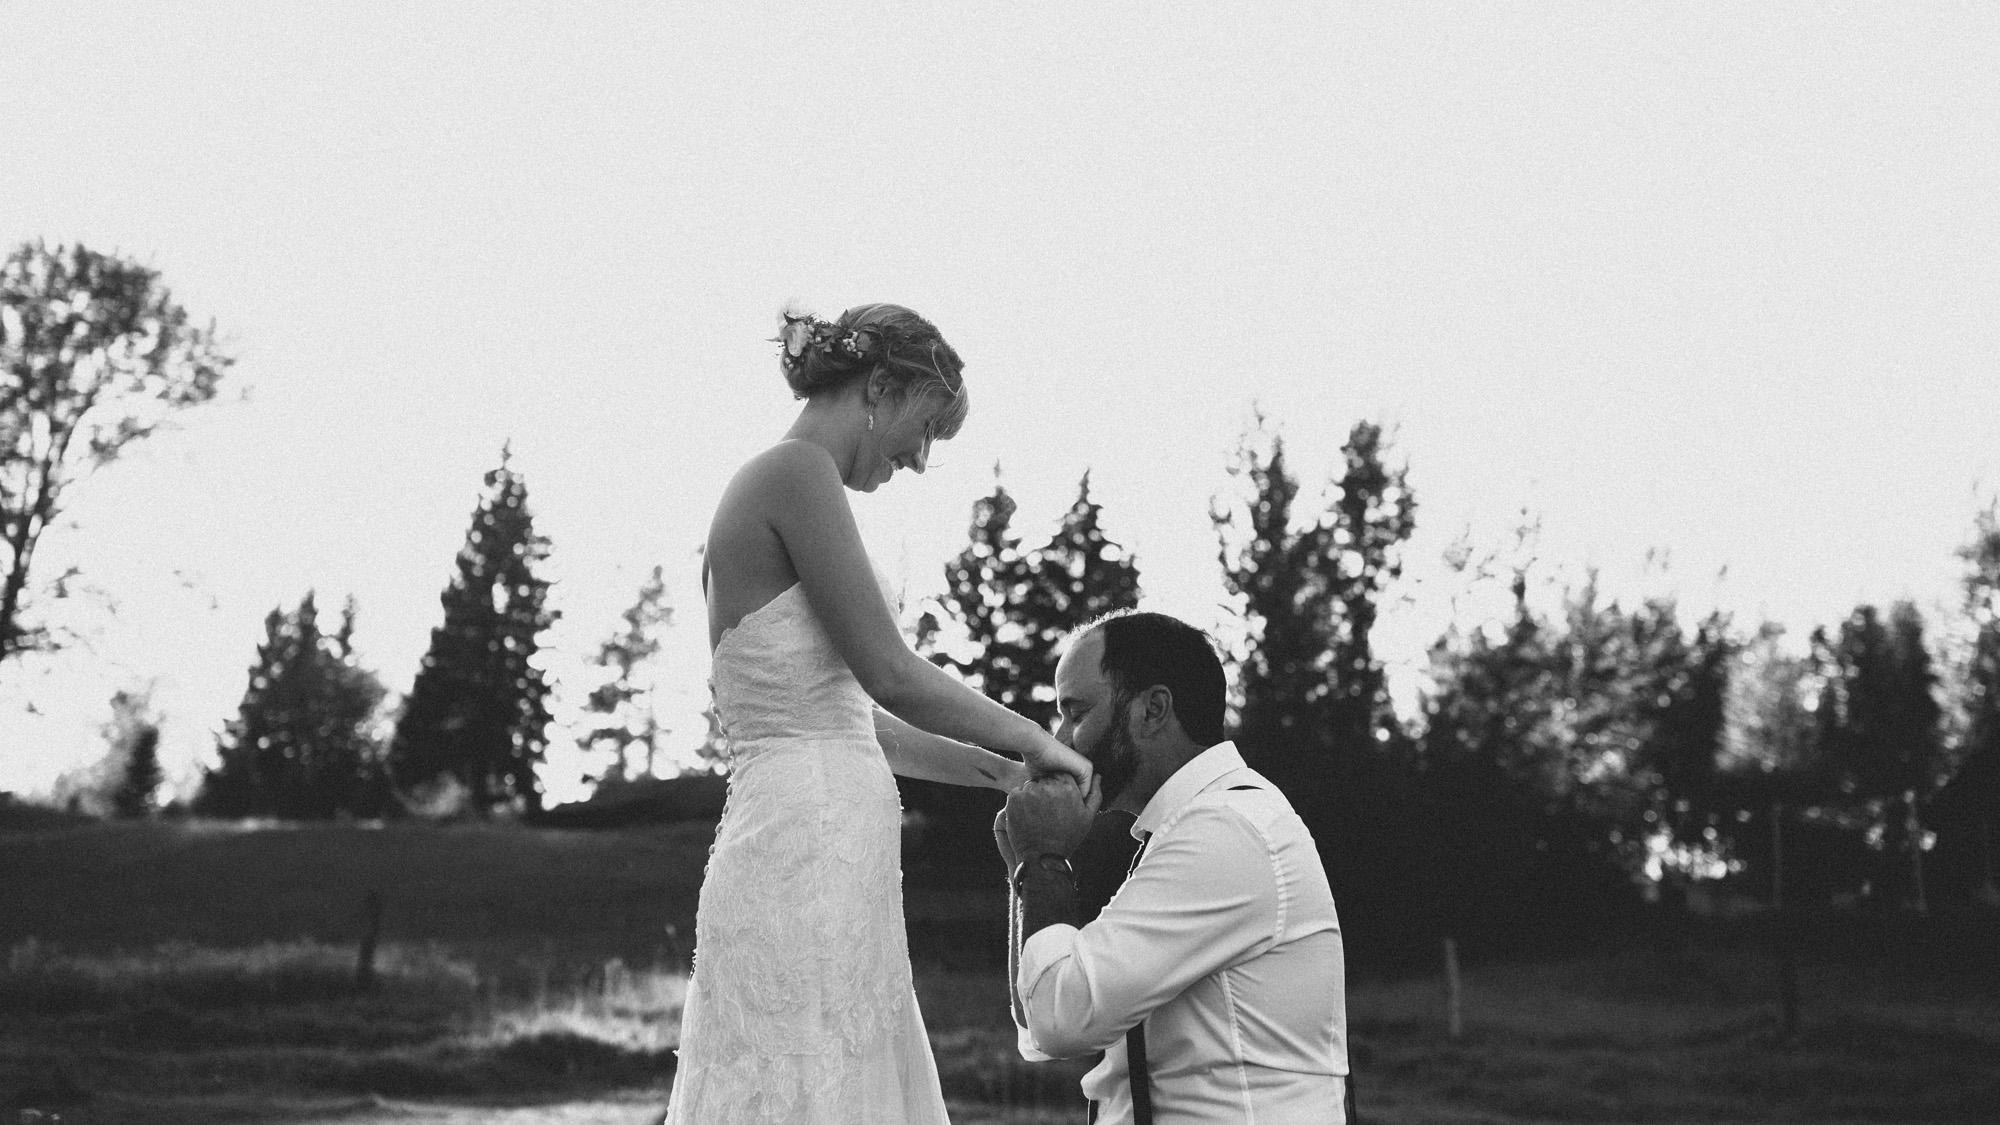 Montana_Wedding_Photos_alec_vanderboom-0123.jpg